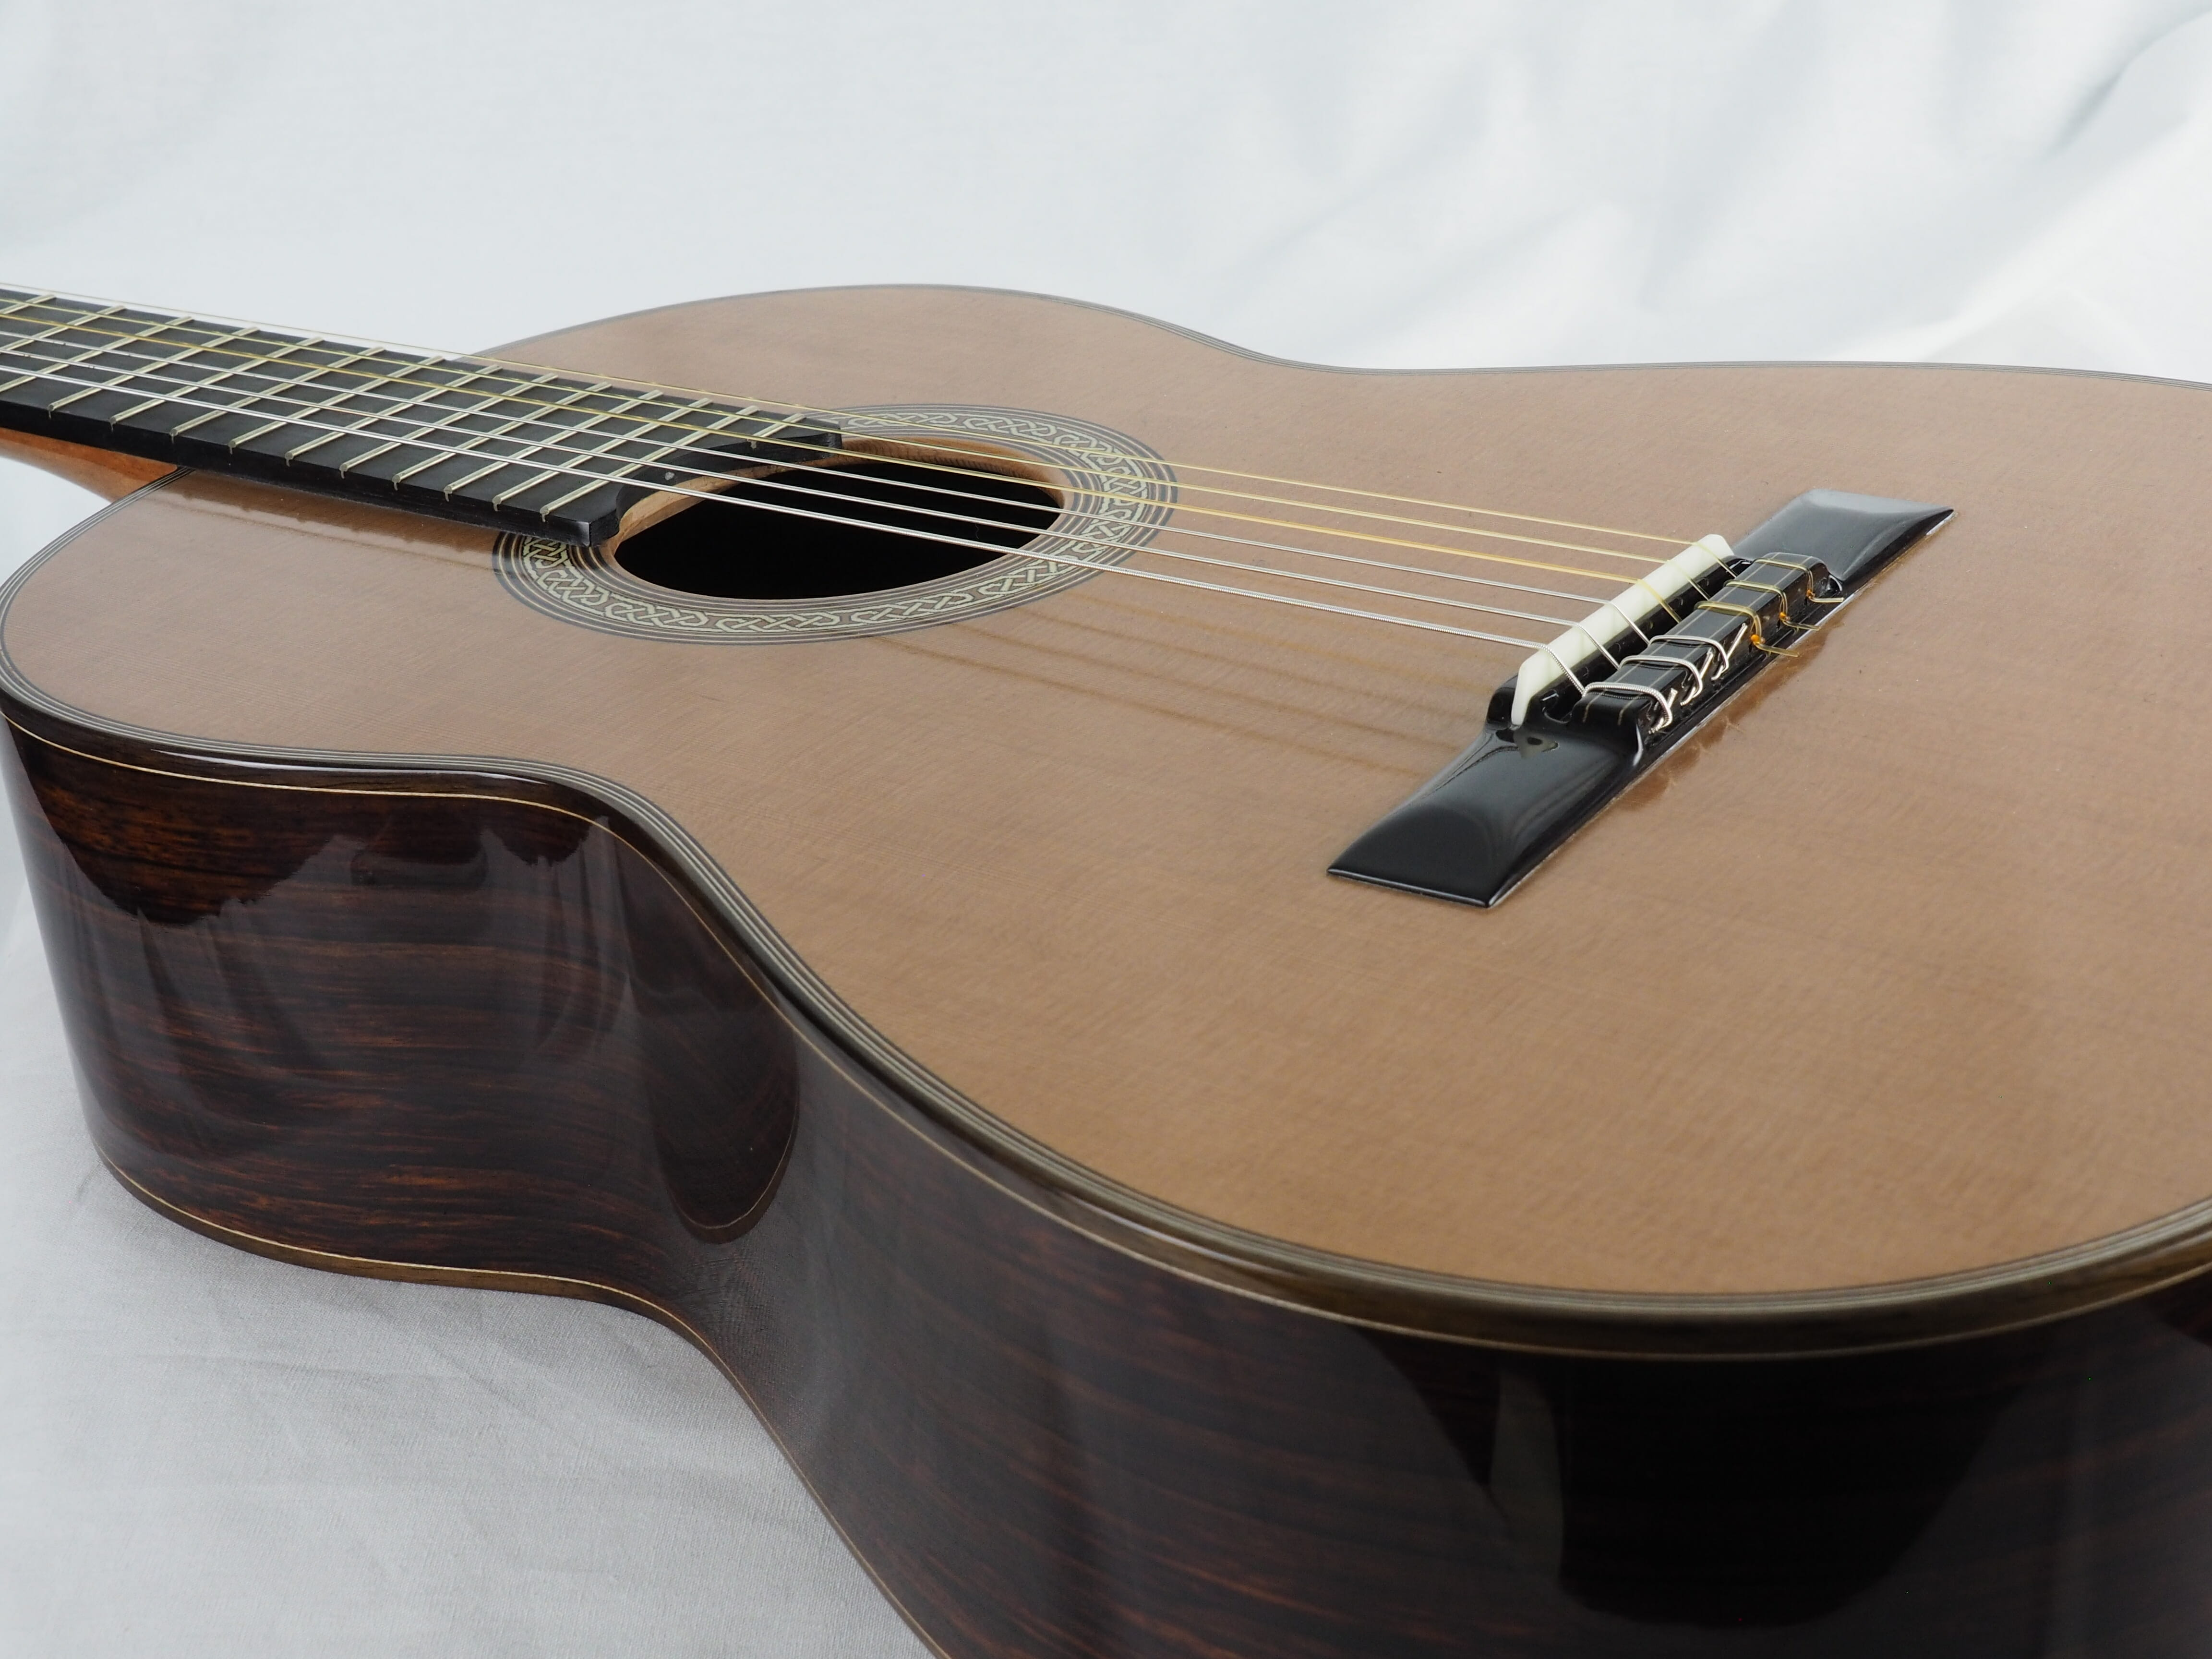 Michael O'Leary Guitare classique n°219